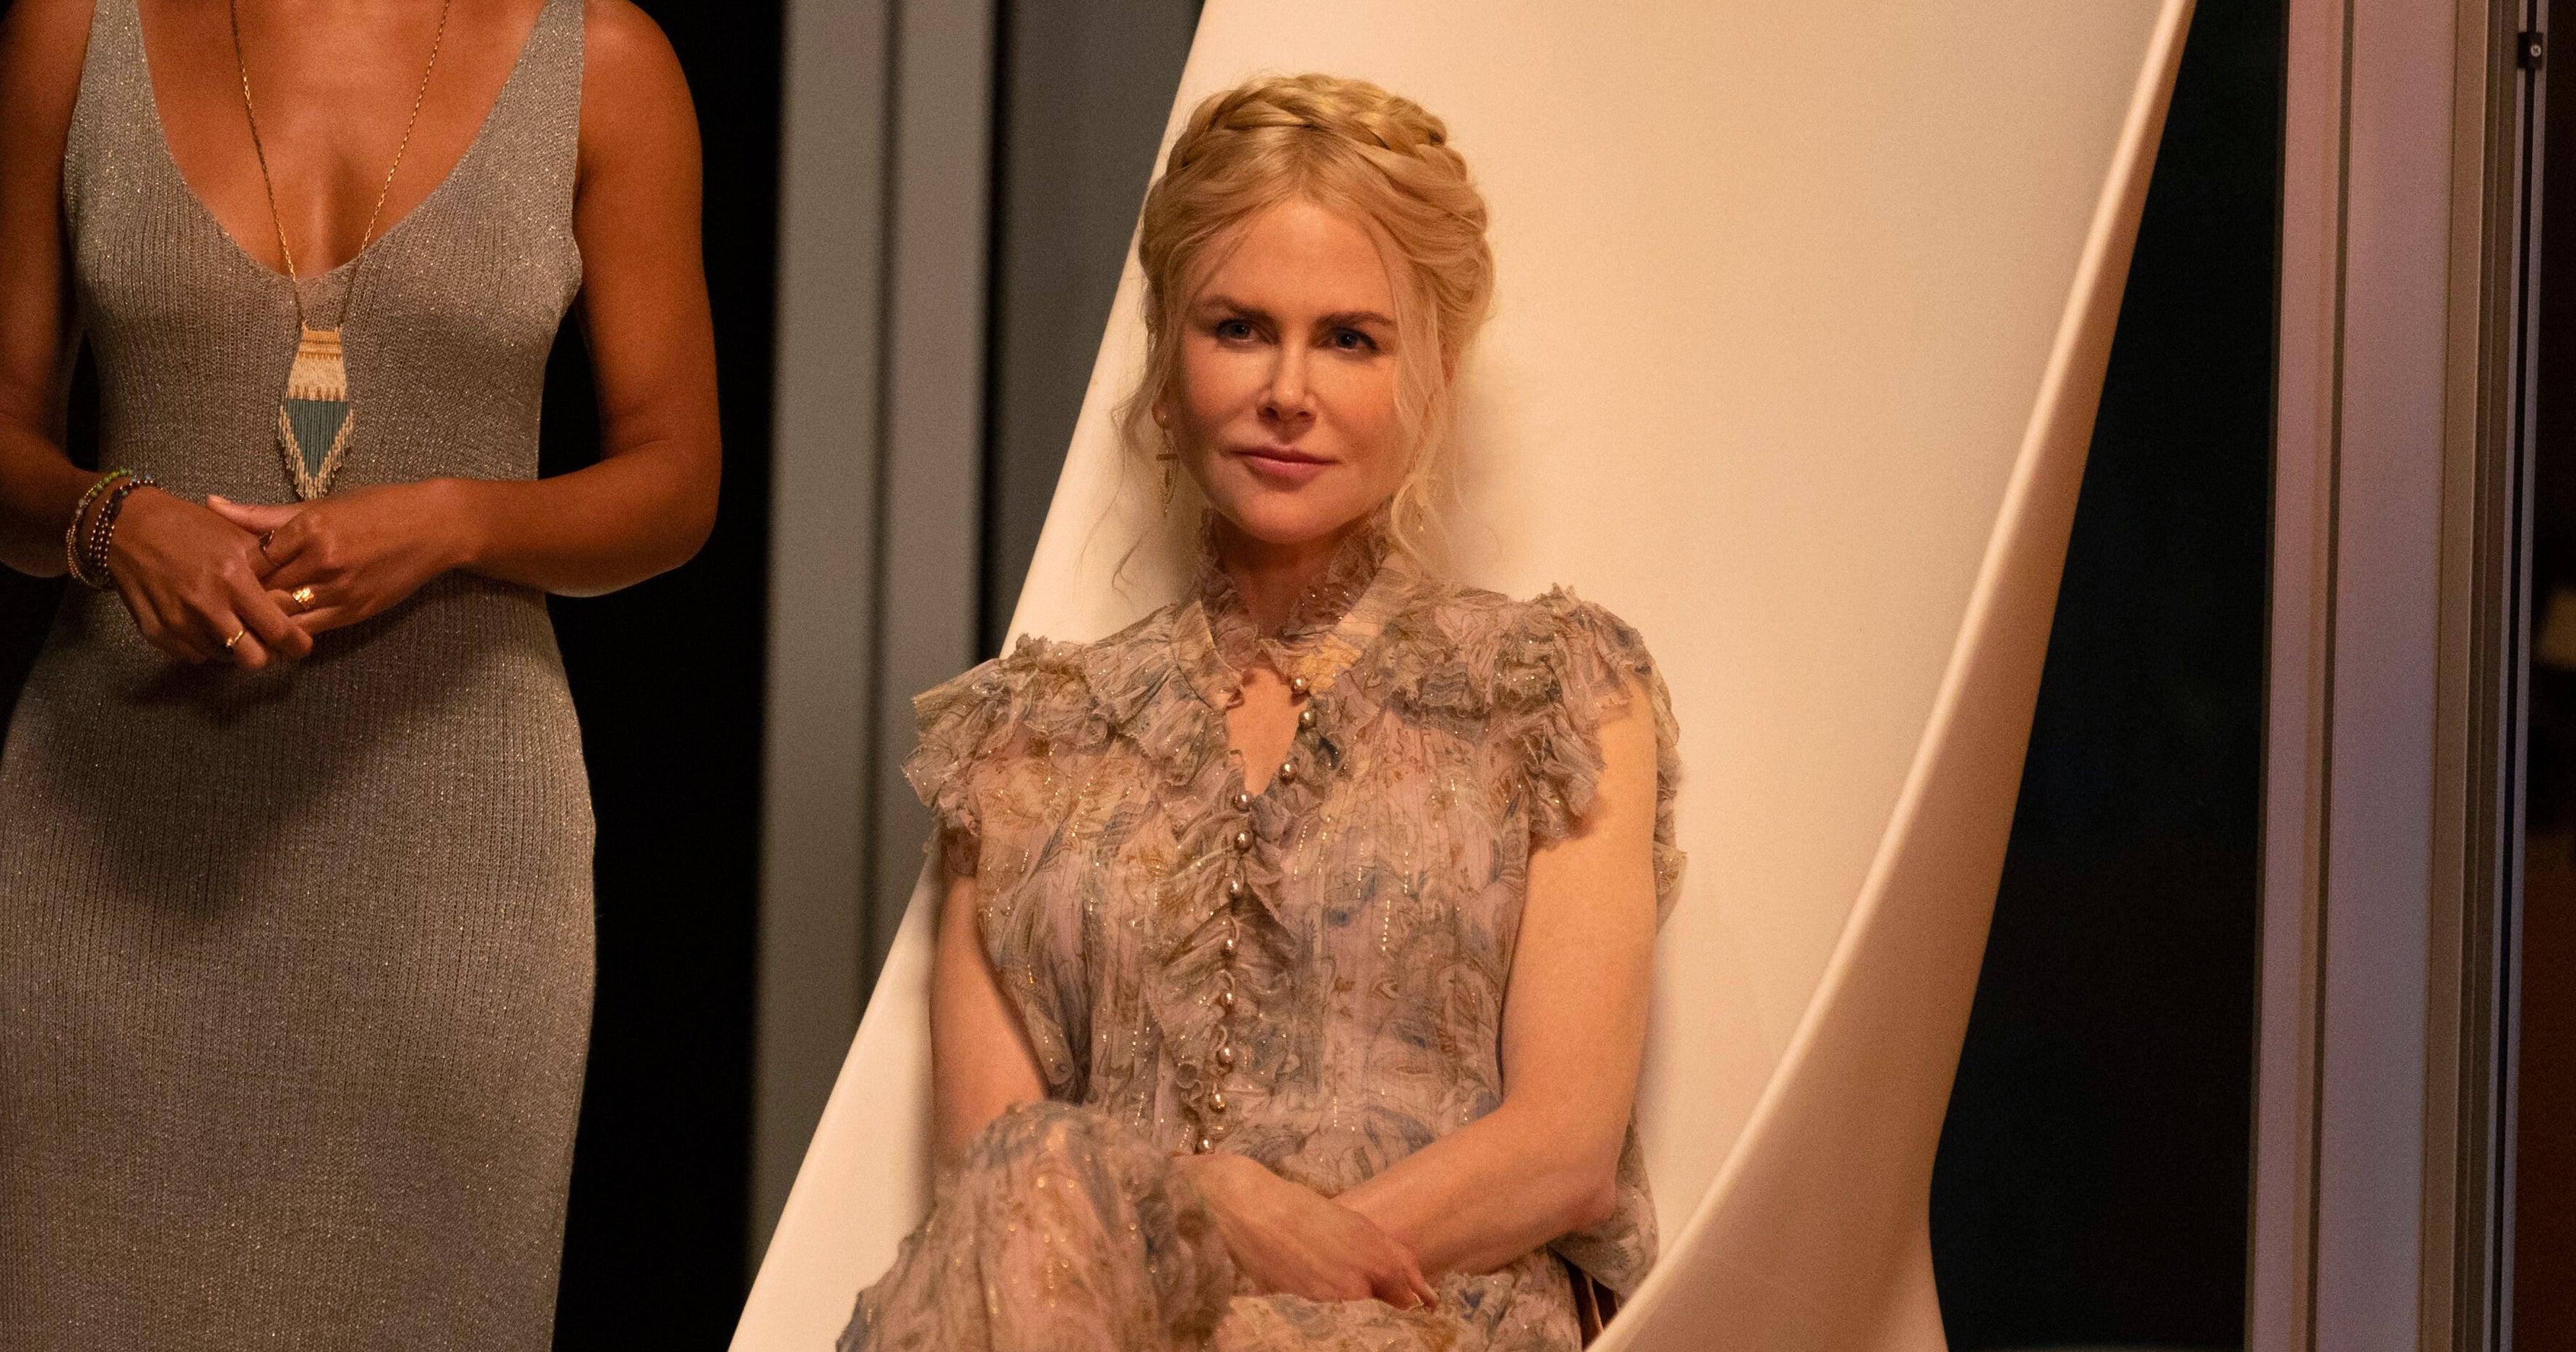 Nicole Kidman's Accent Puts The Strange In Hulu's Nine Perfect Strangers